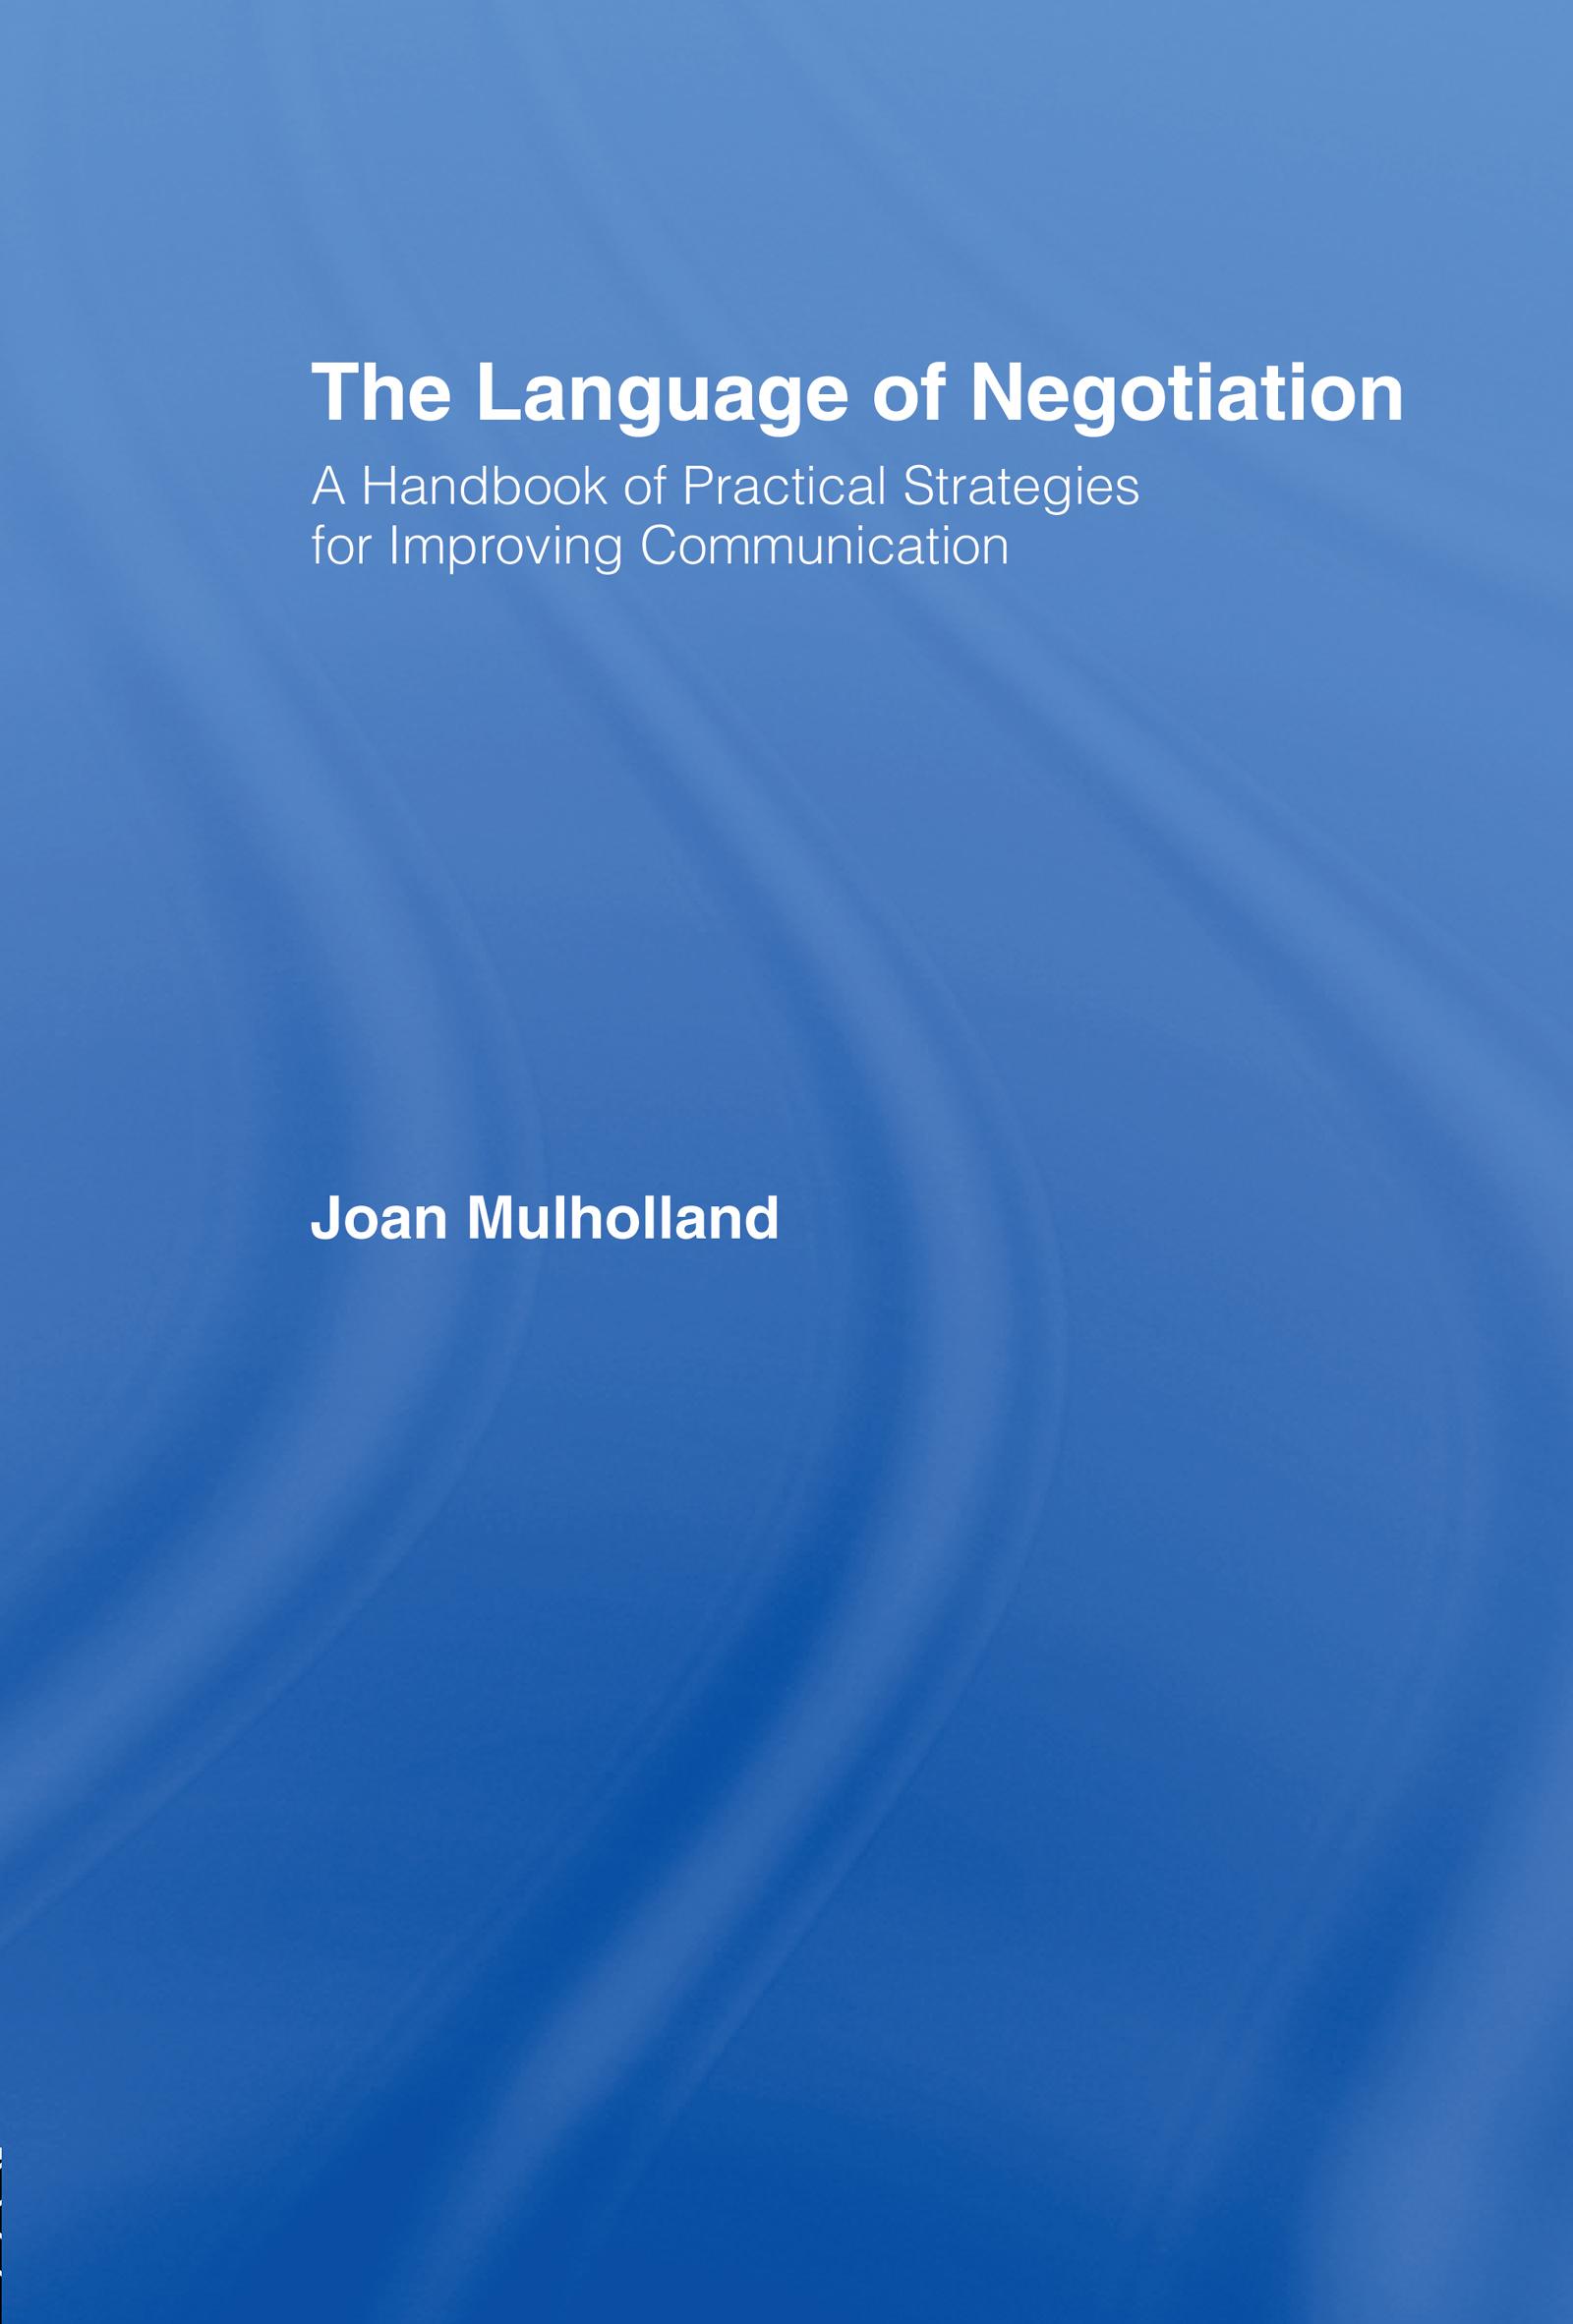 The Language of Negotiation